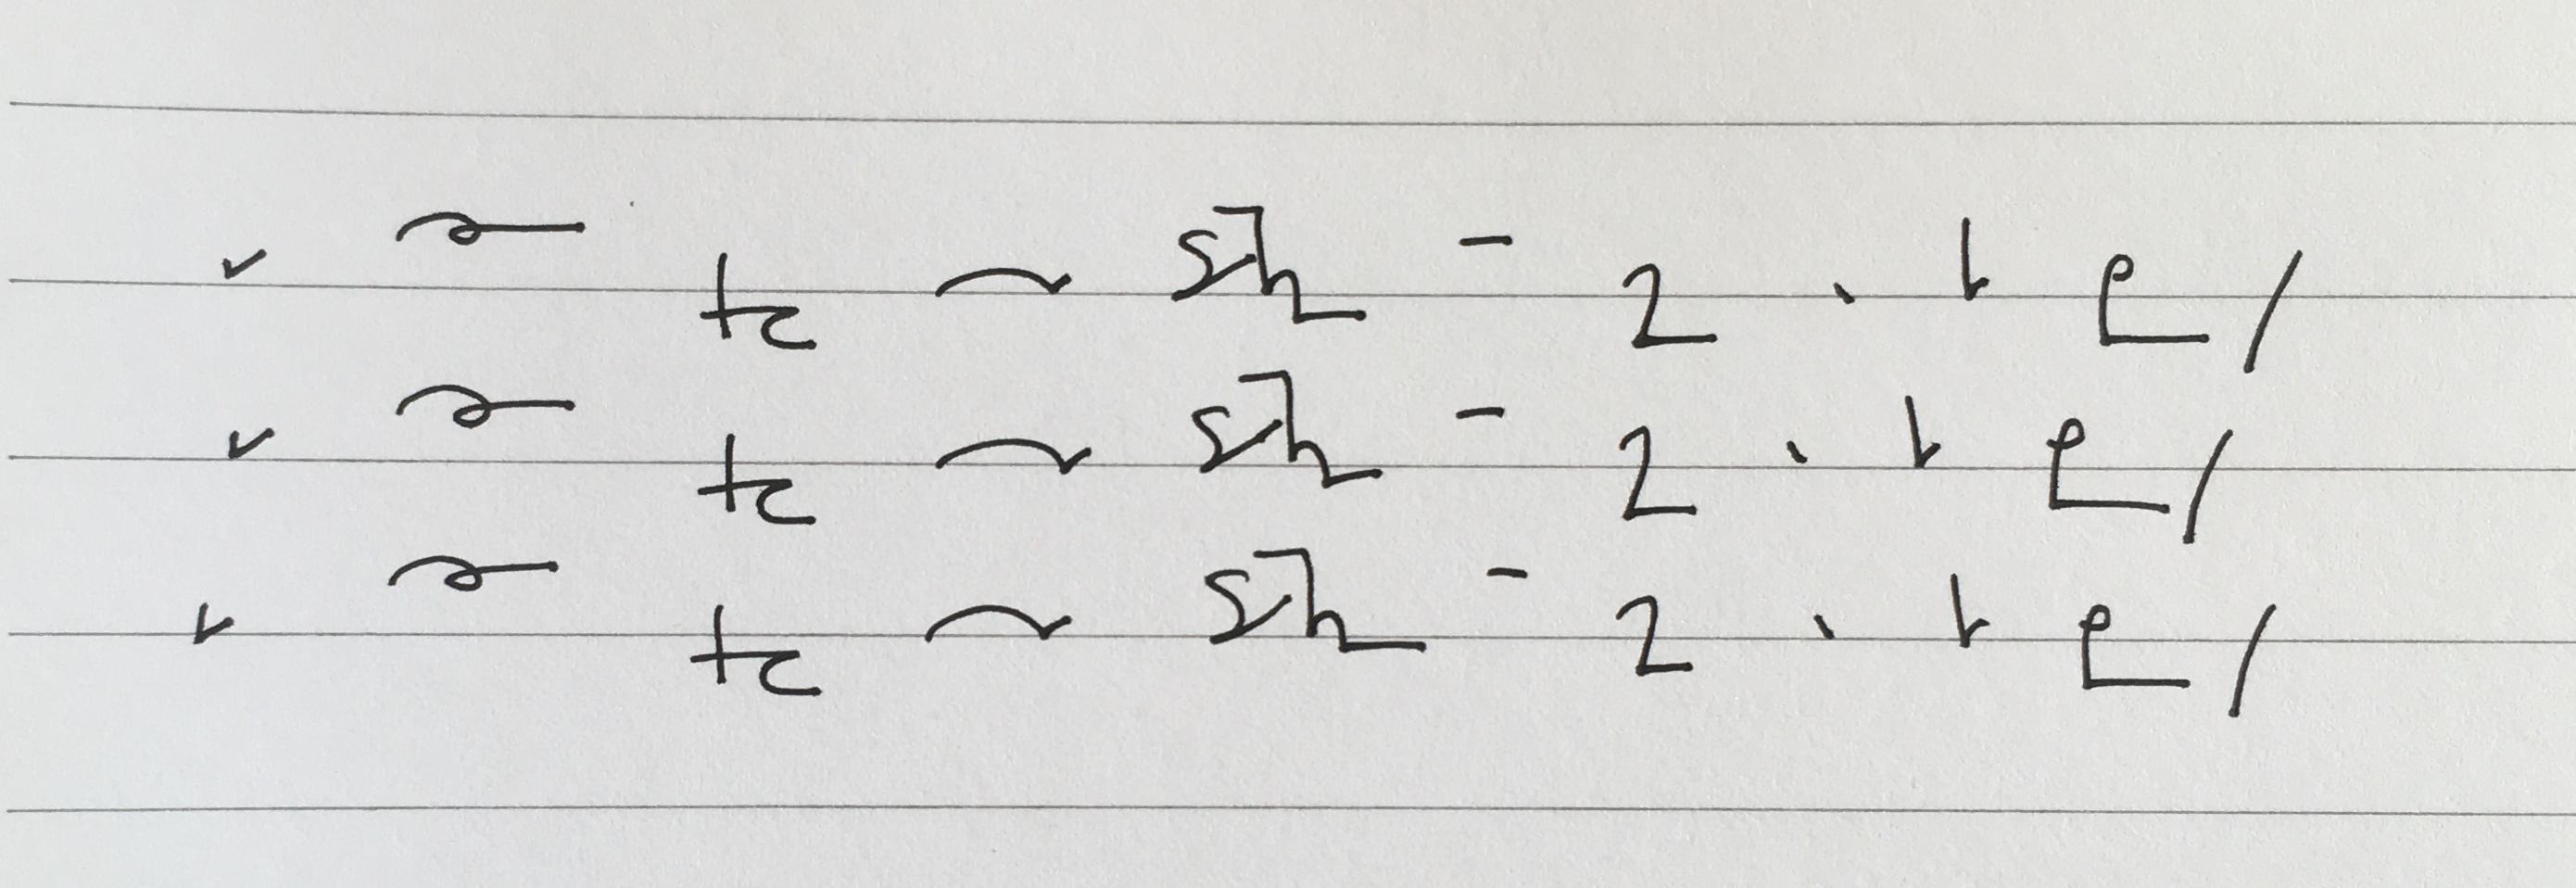 Easy Teeline Shorthand Sentences